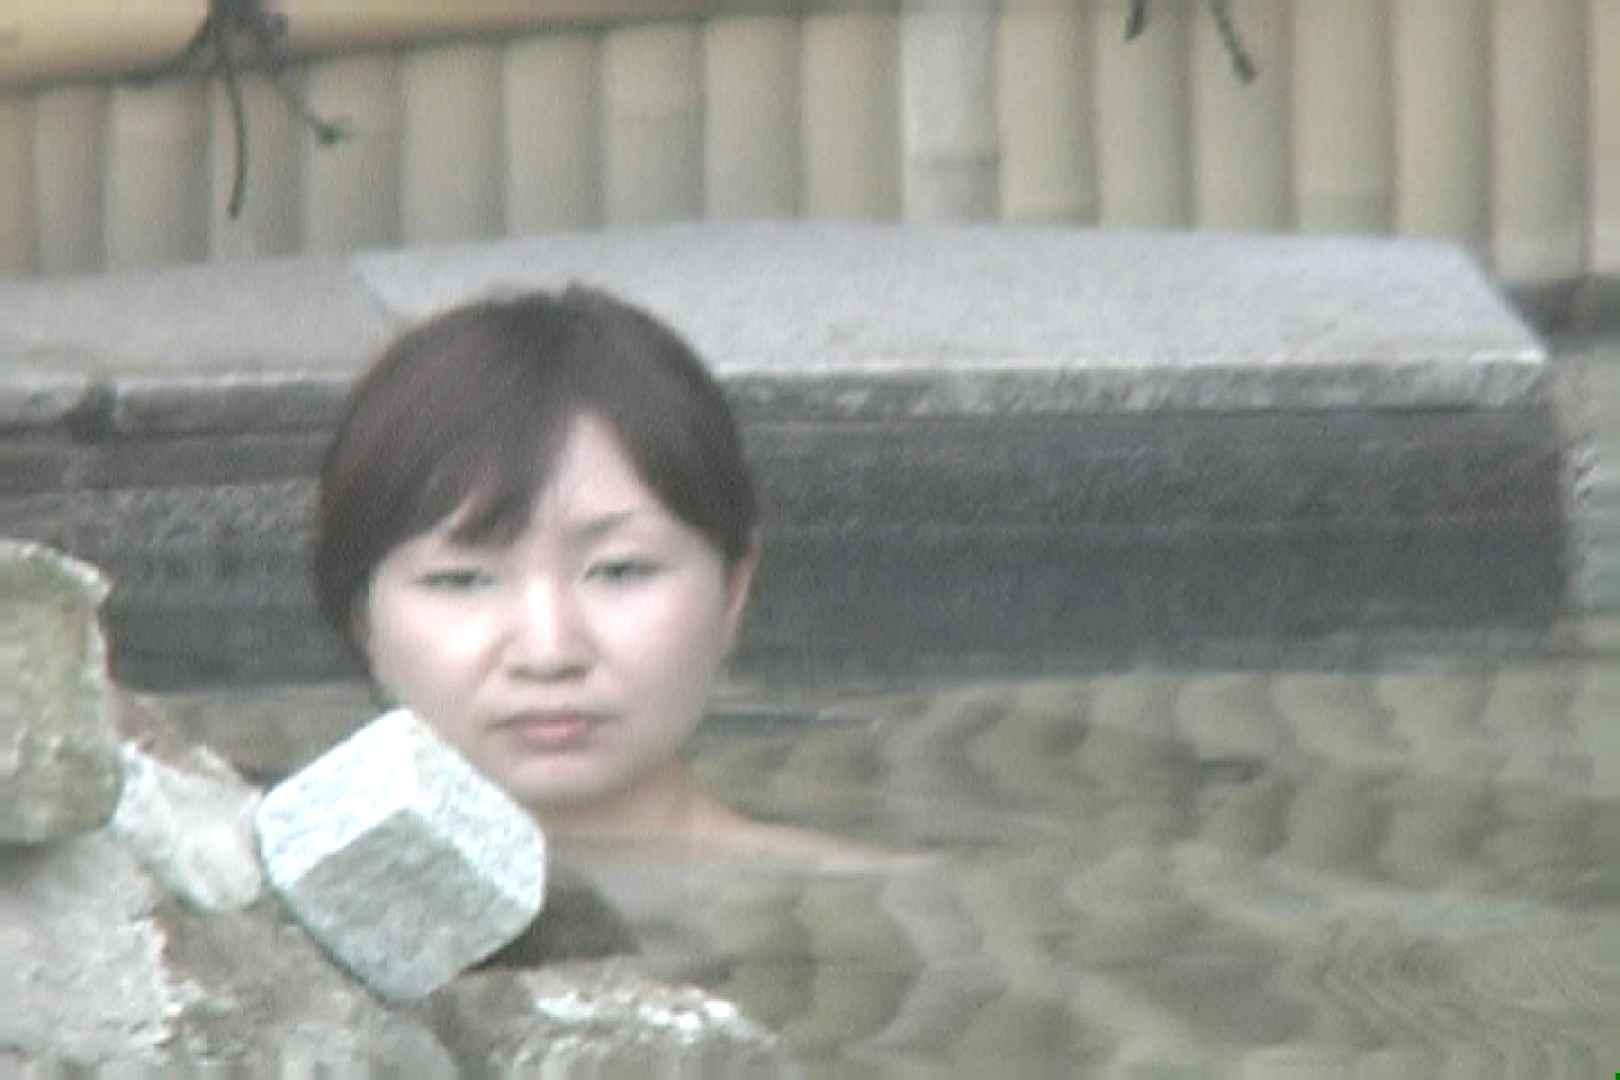 Aquaな露天風呂Vol.695 OLのエロ生活 オマンコ無修正動画無料 35連発 17